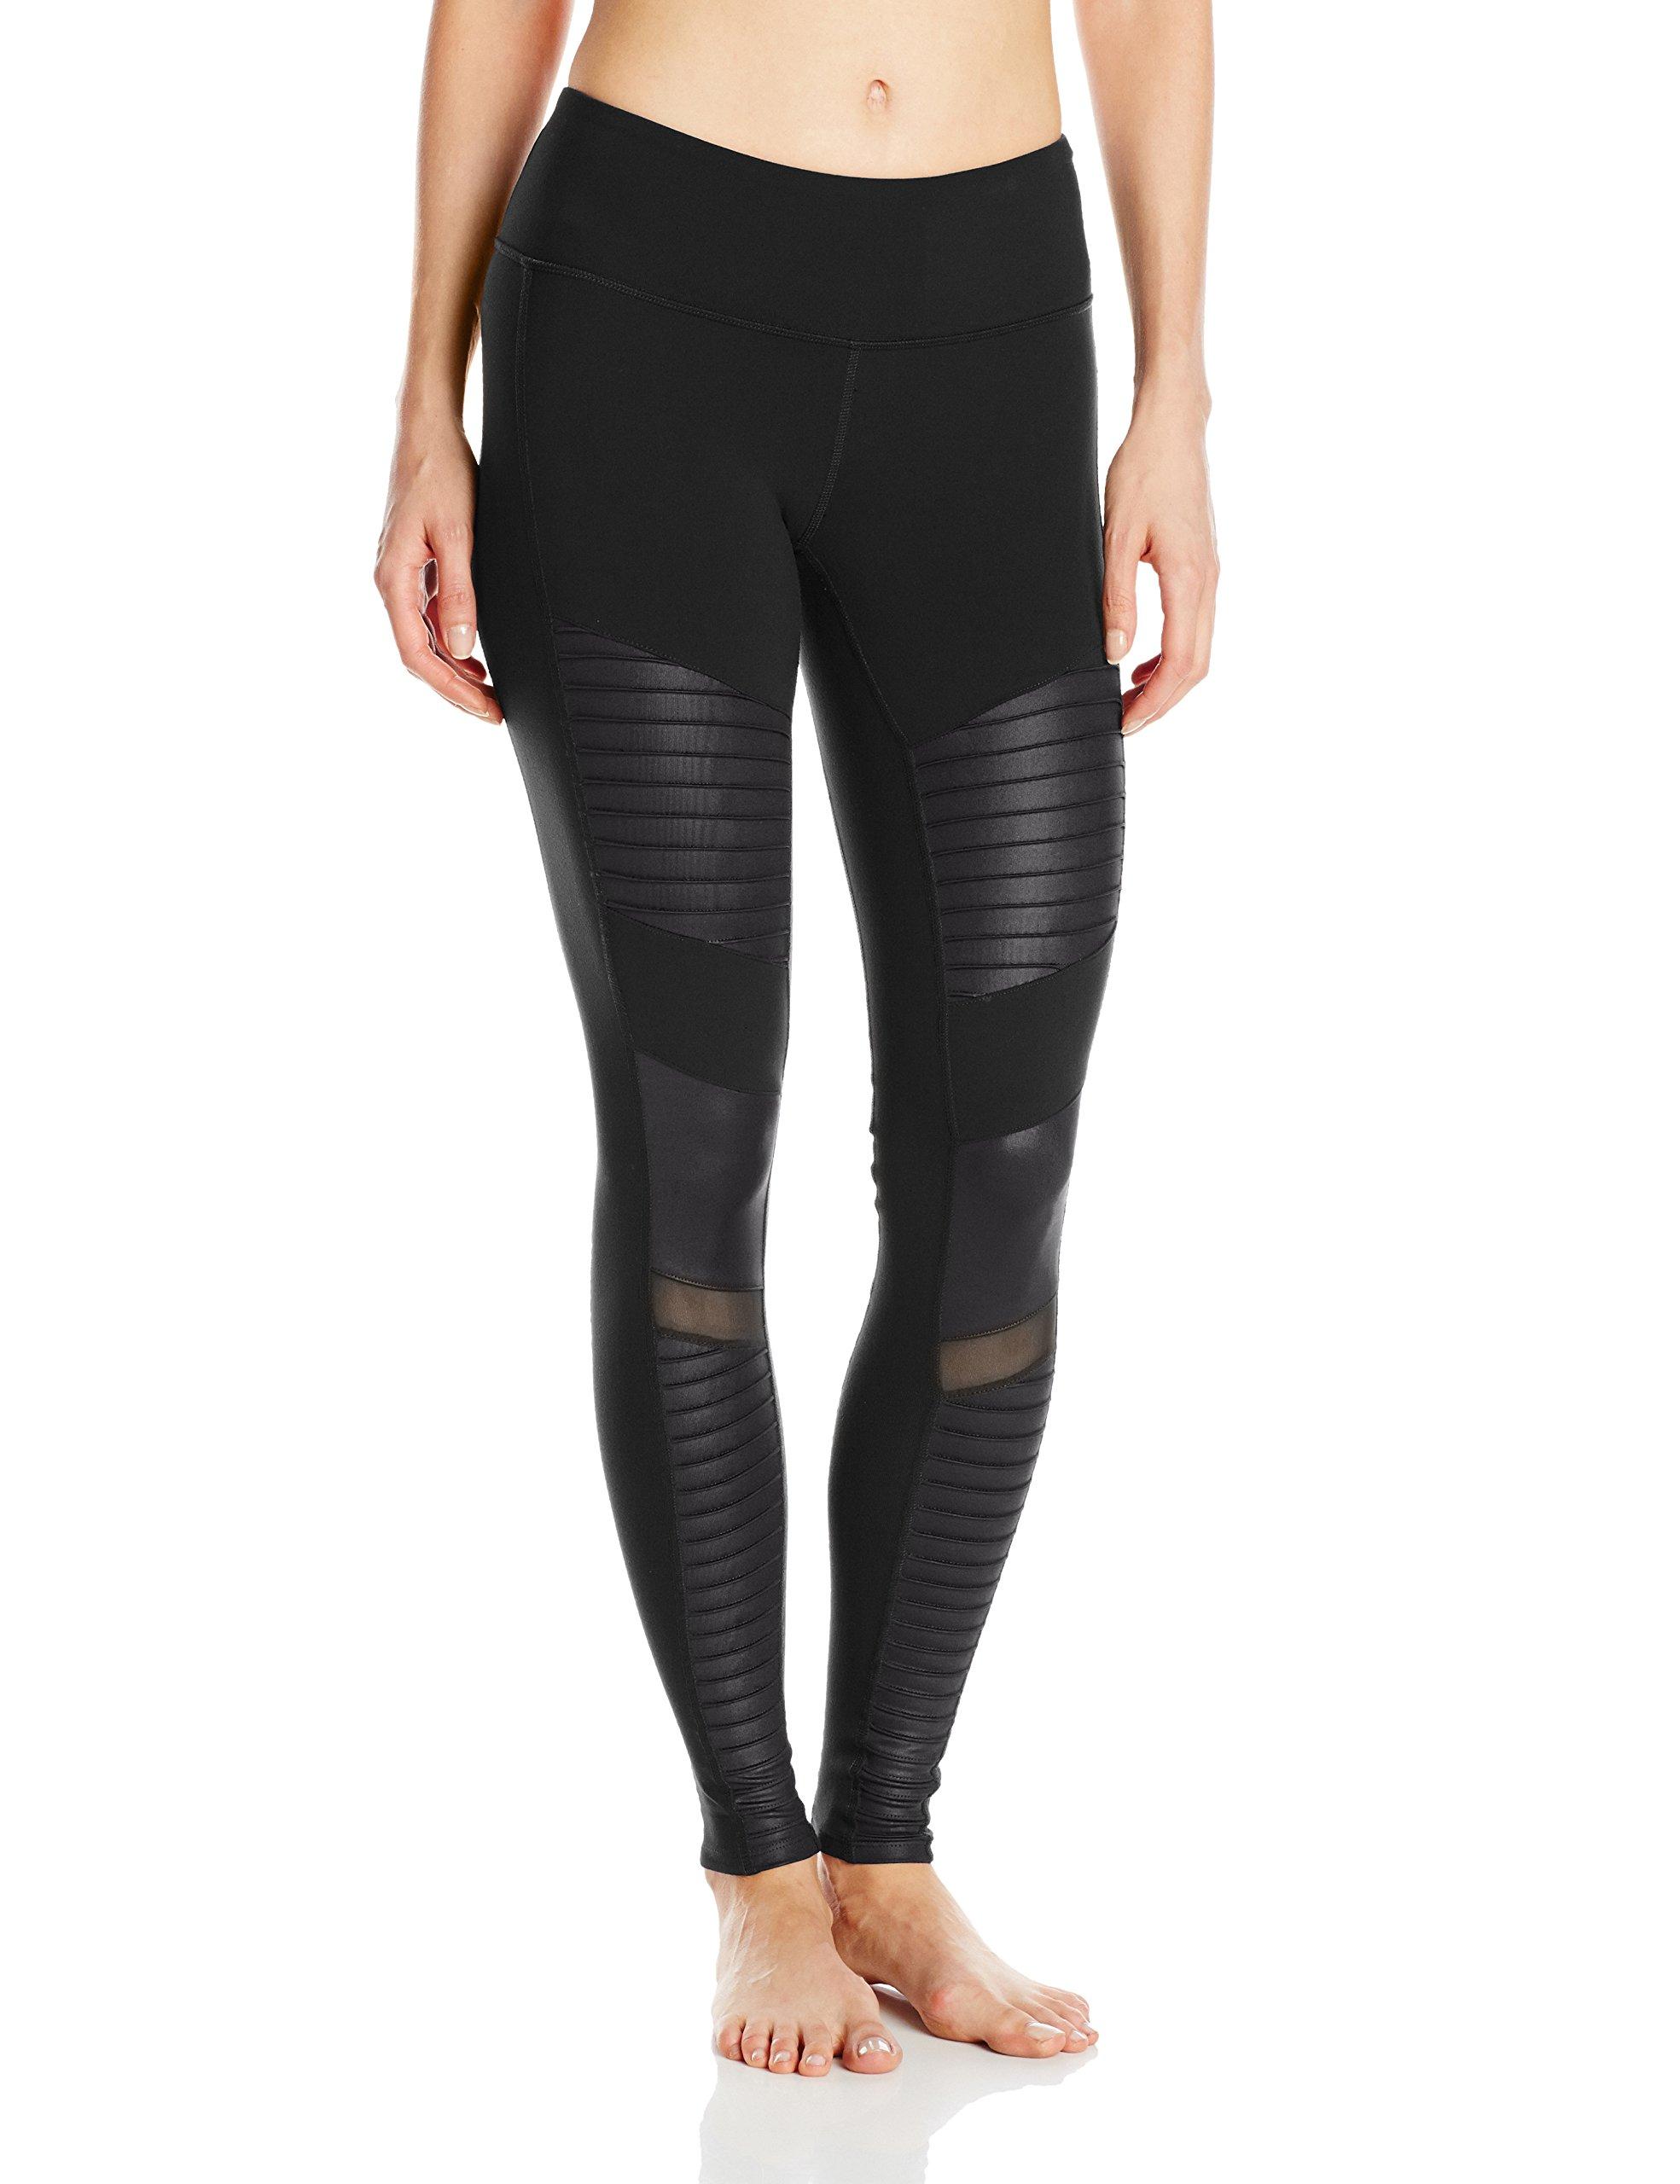 Alo Yoga Women's Moto Legging, Black/Black Glossy, M